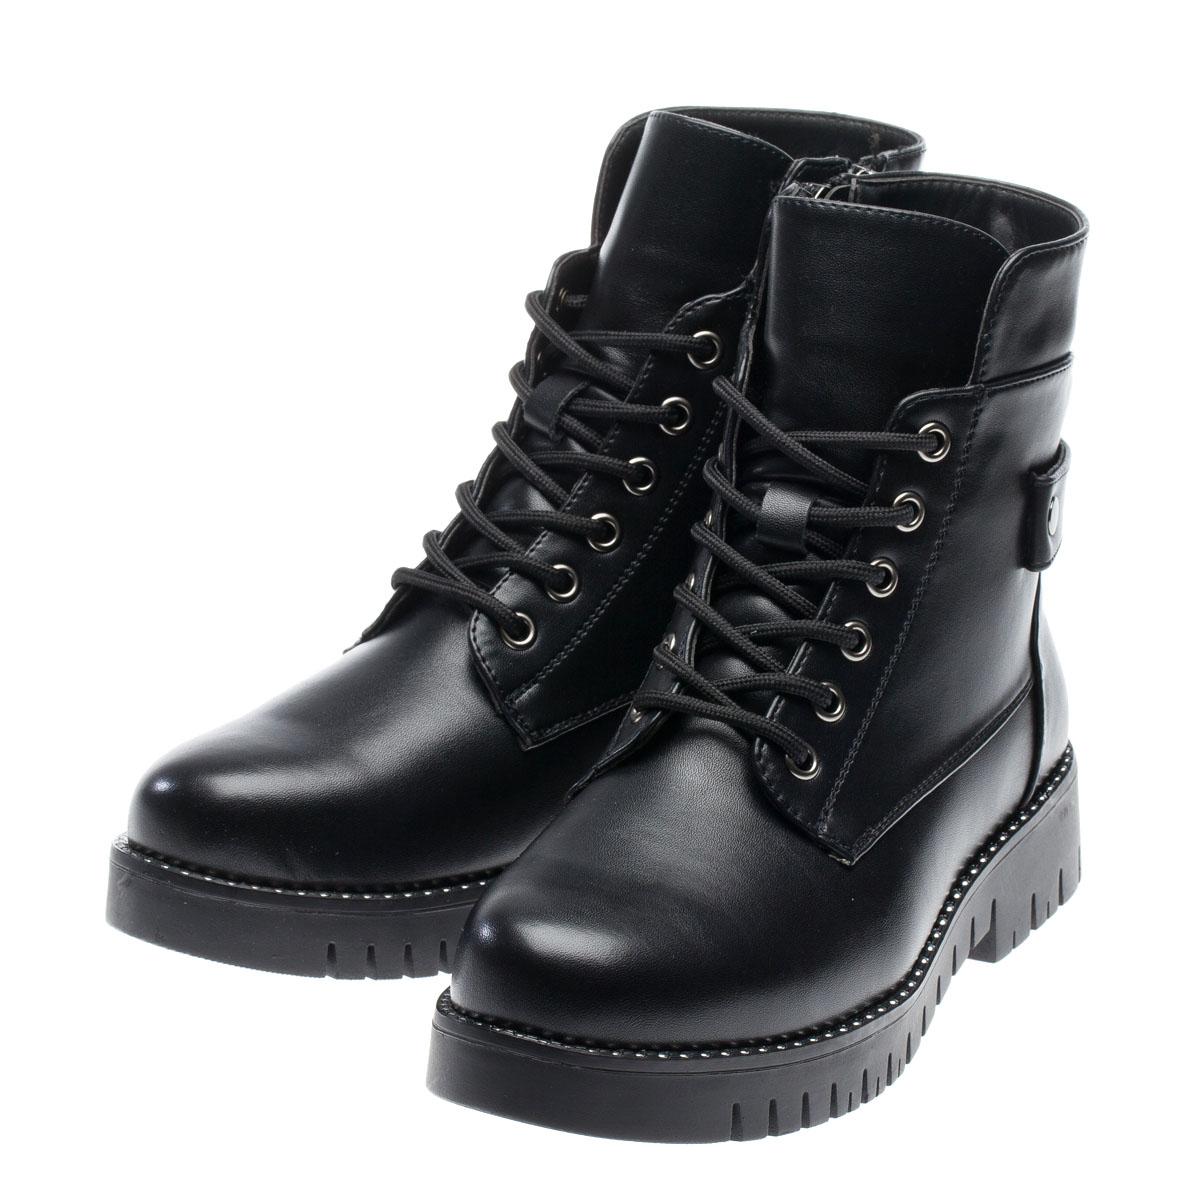 Ботинки зимние FERTO, F18-6135